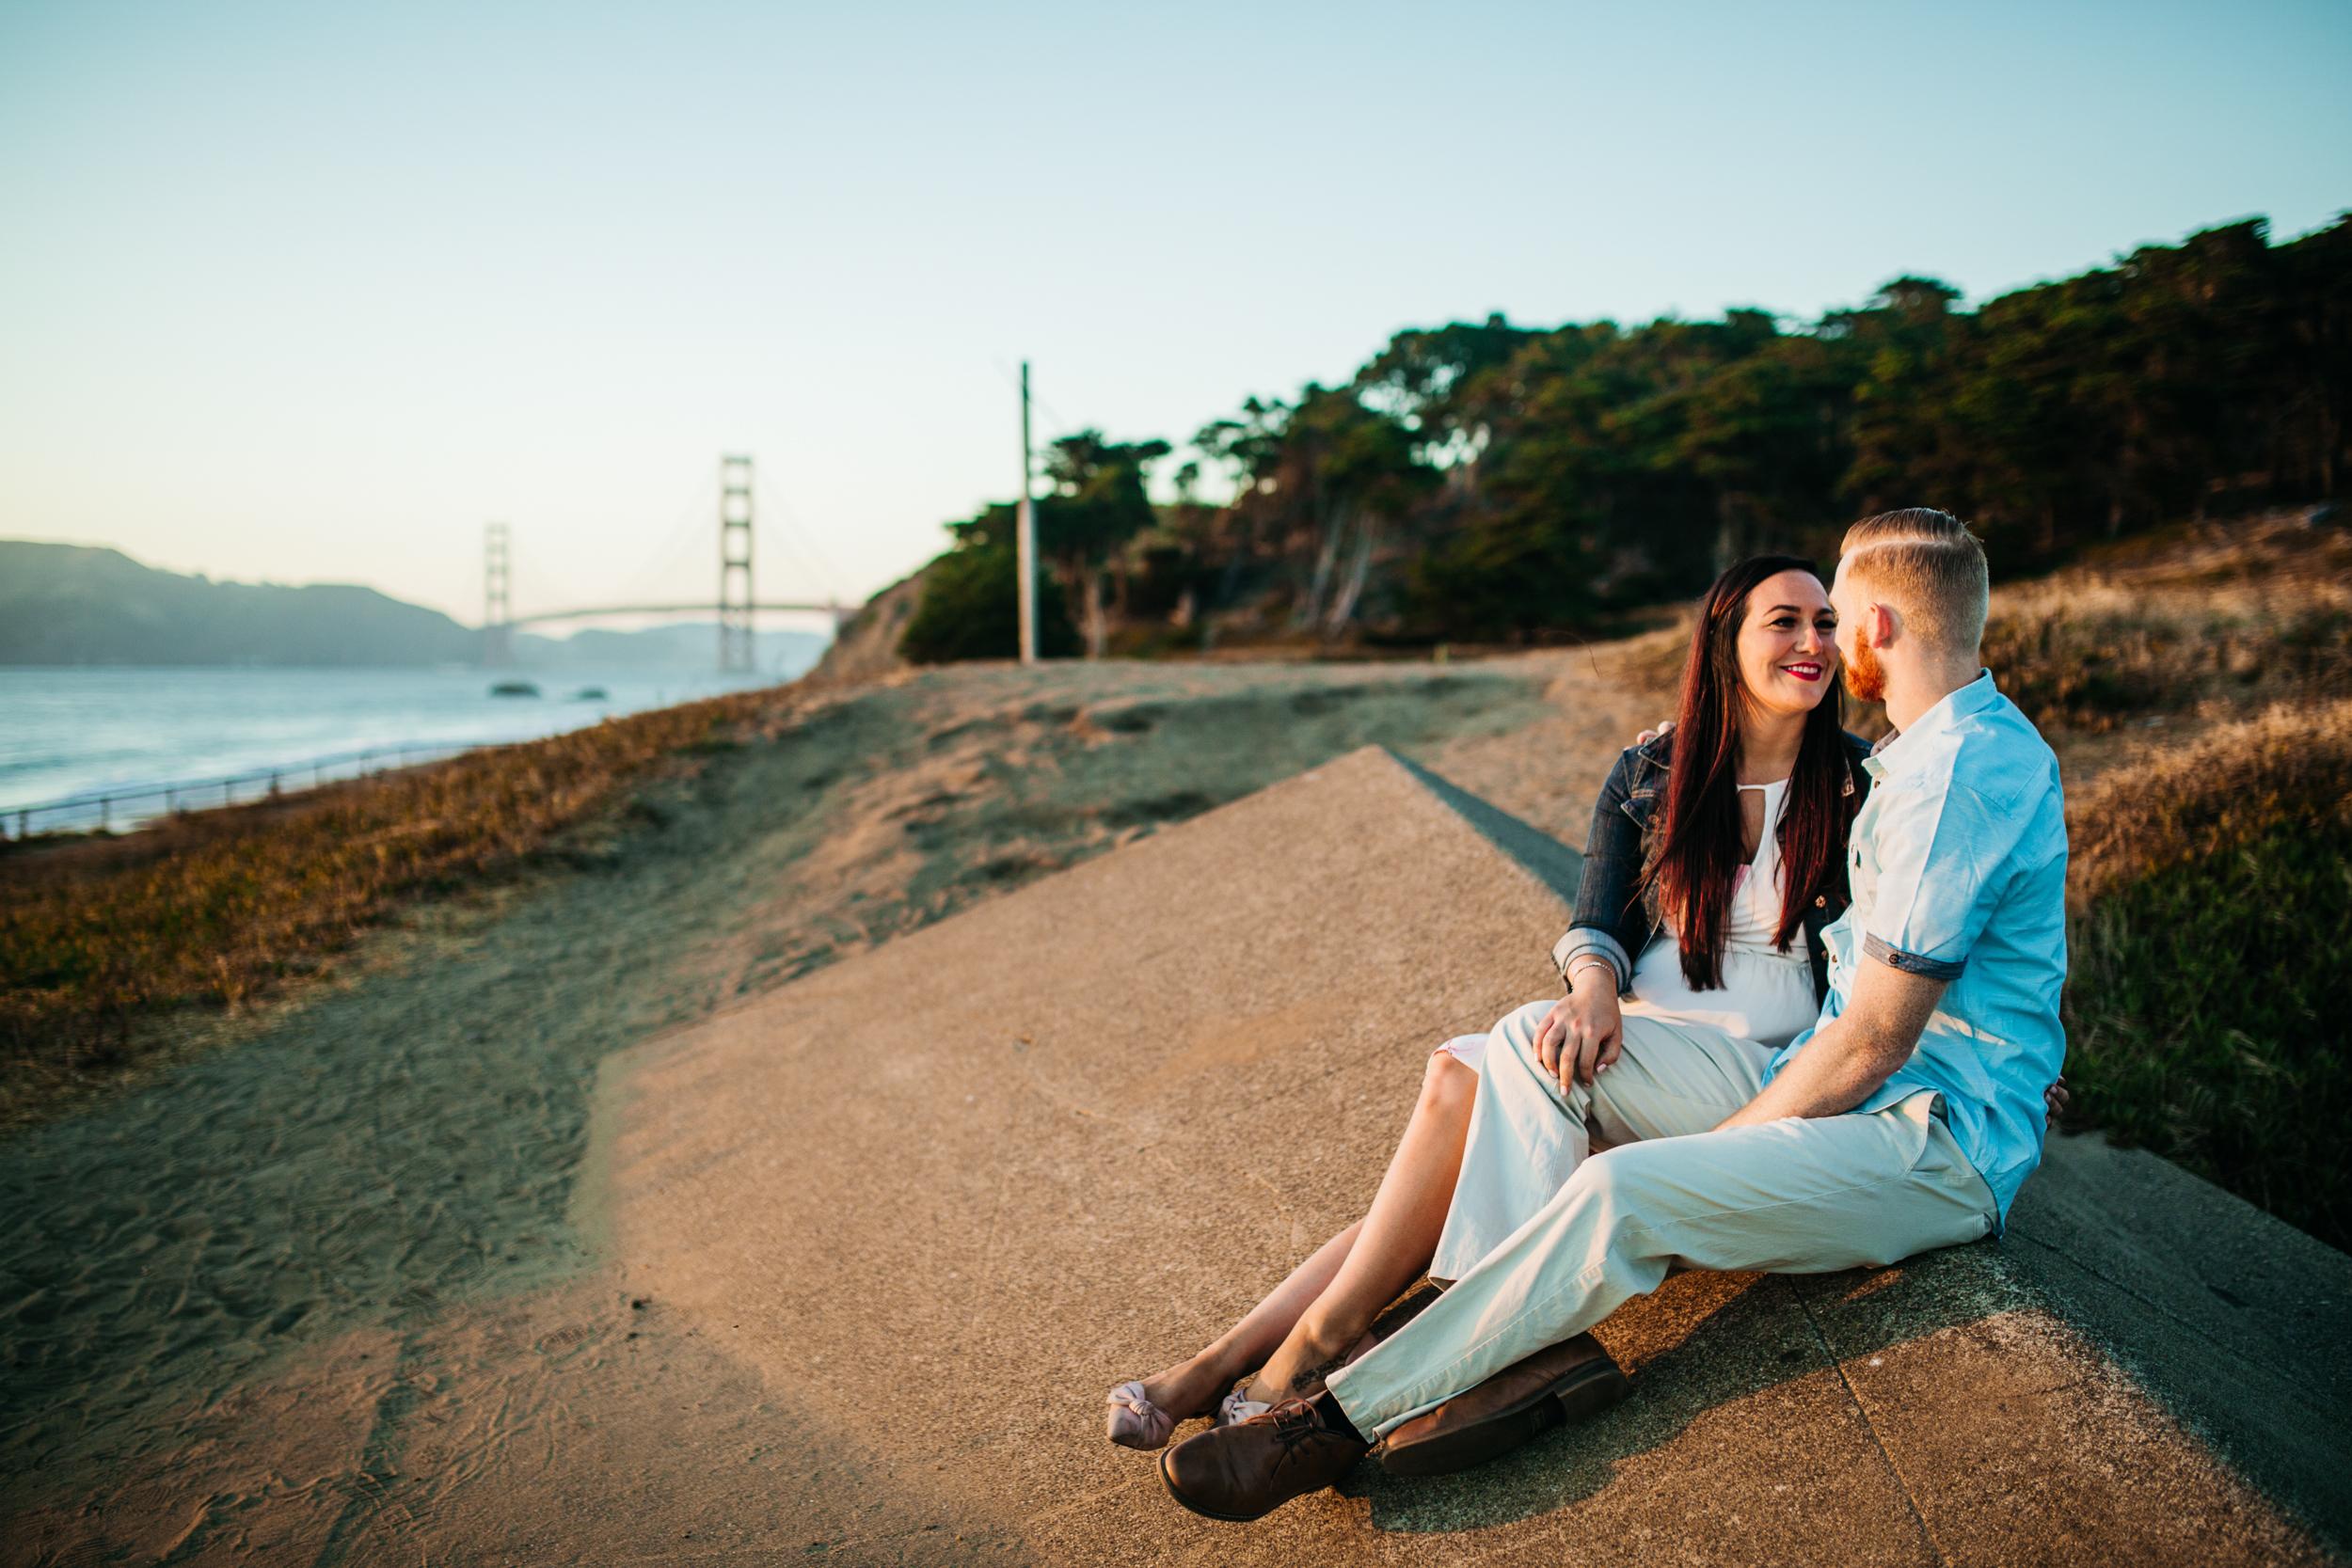 Engagement Photos-San Fransisco-Golden Gate Park-Ranalla Photo & Films-58.jpg